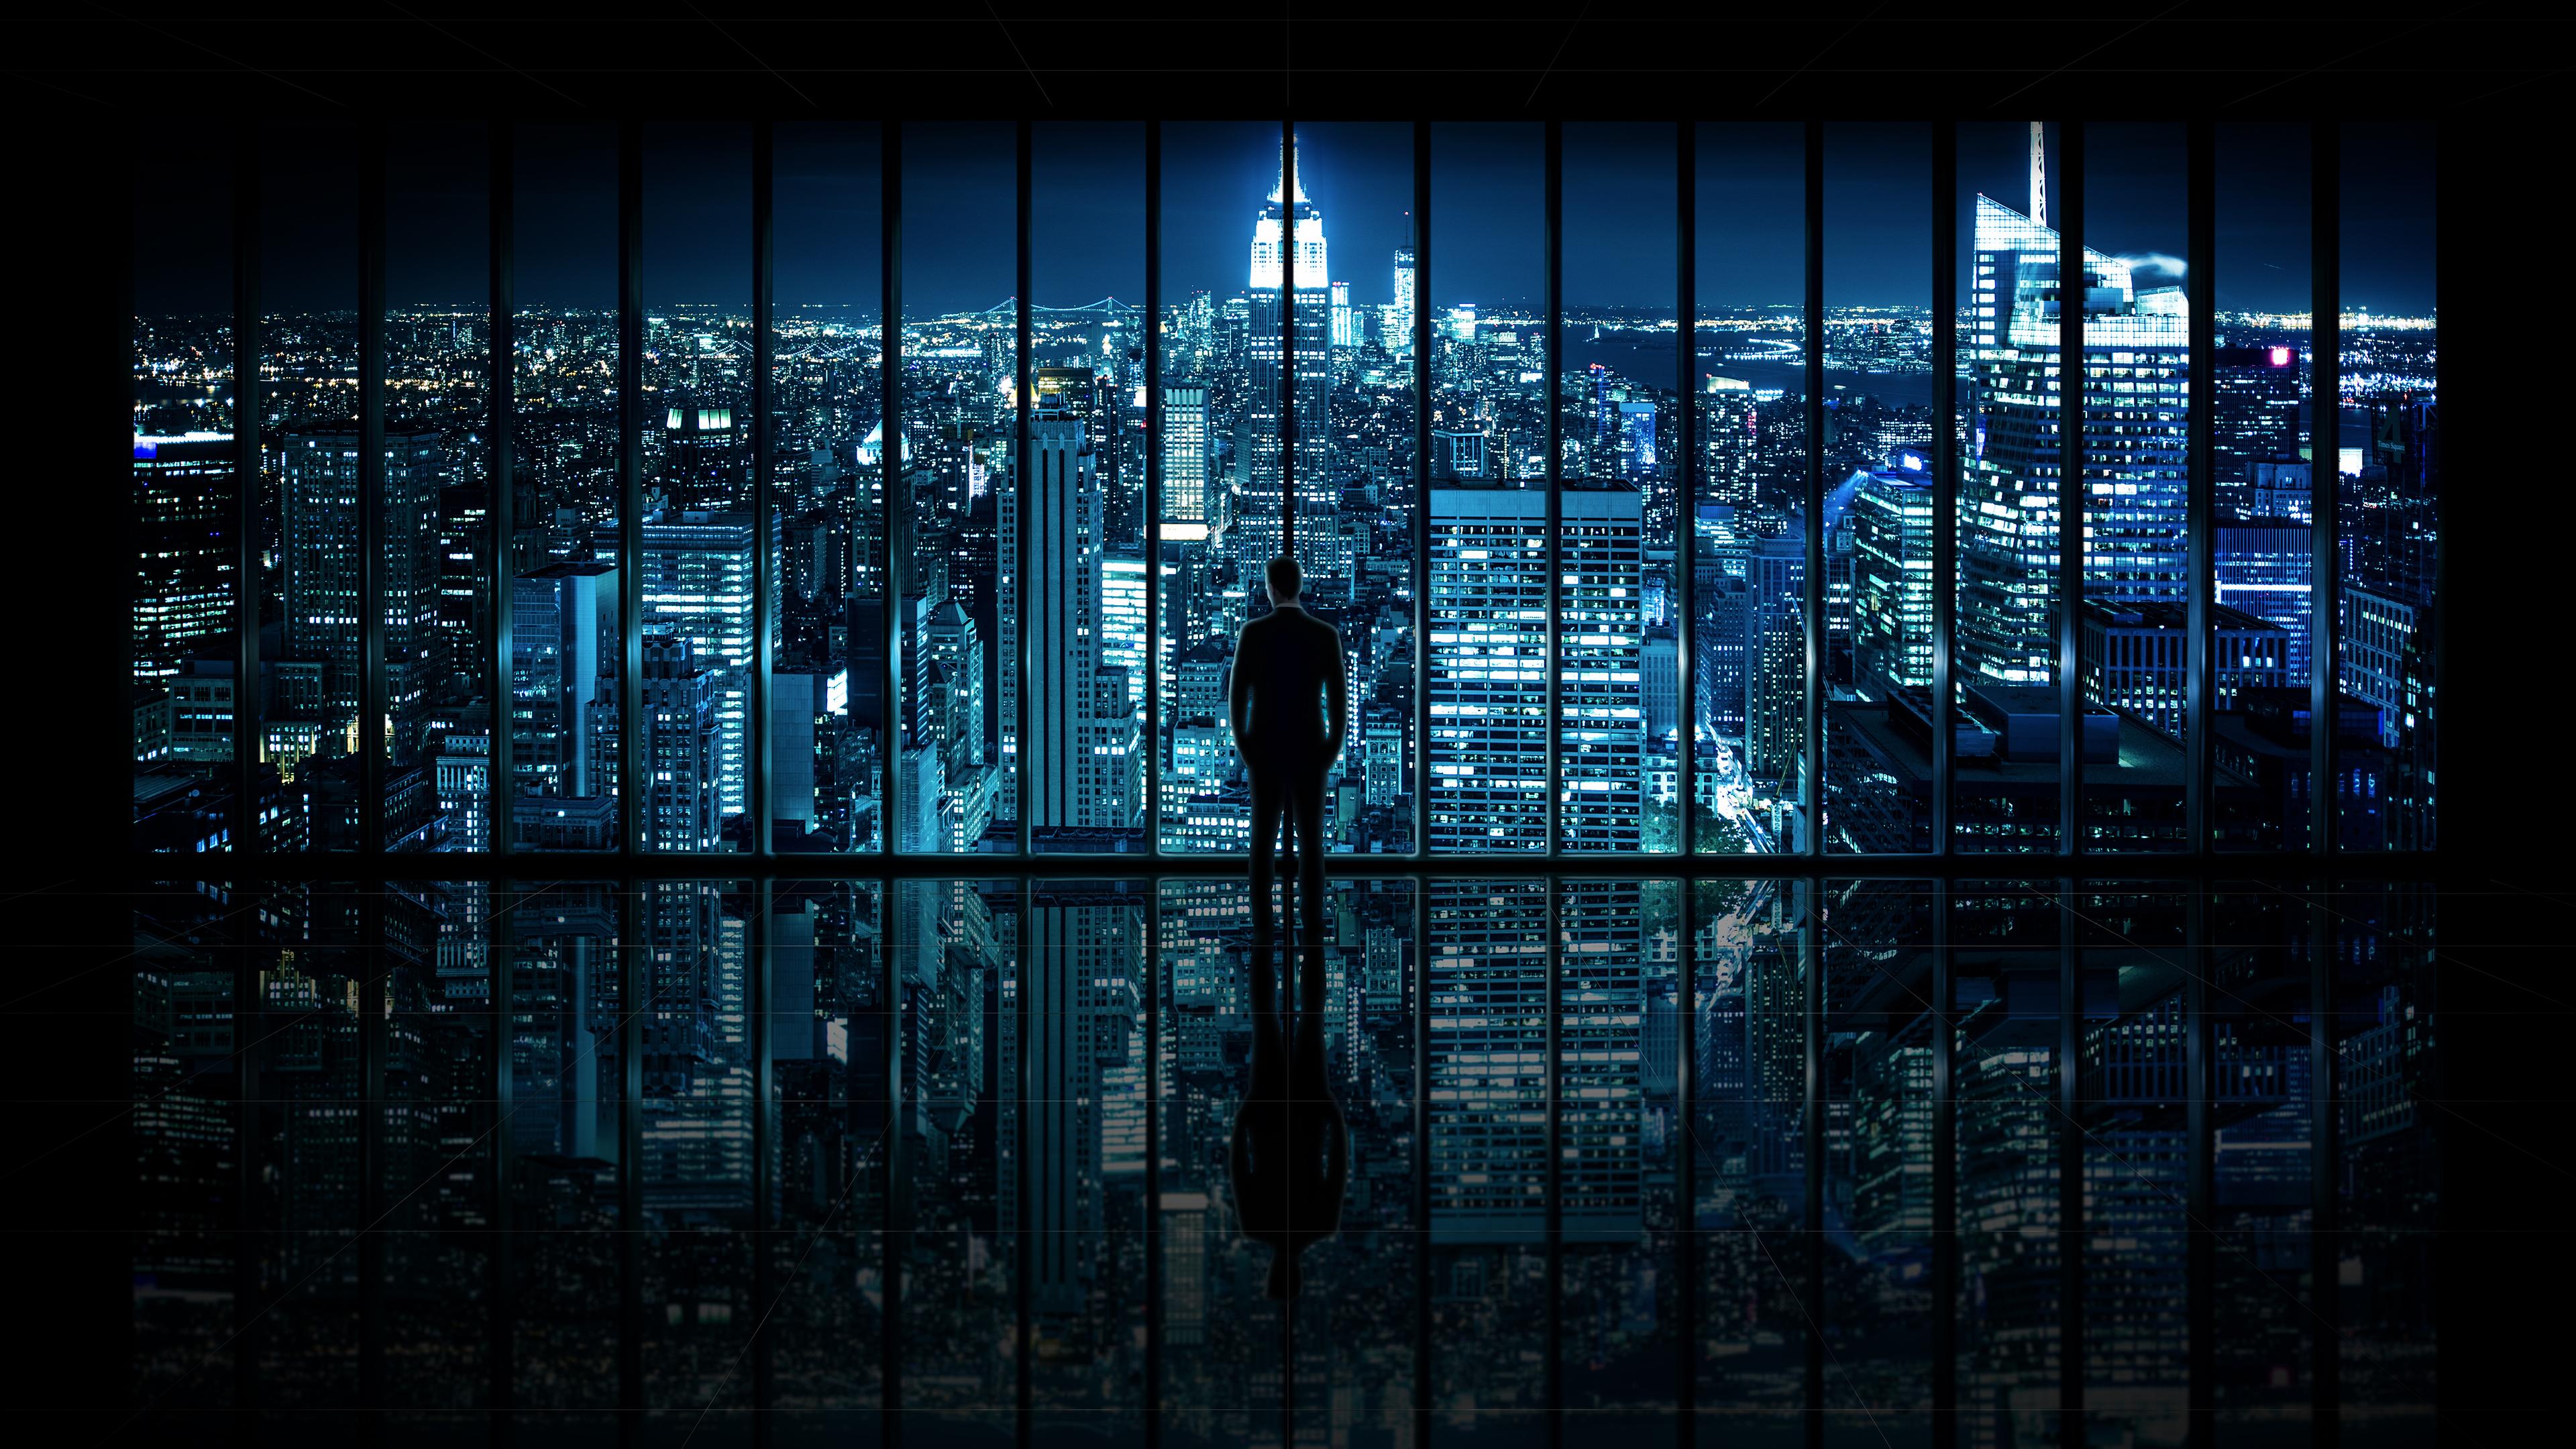 10 Gotham City 4K Wallpaper 4K Wallpaper   Ultra HD 4K Wallpapers 3840x2160